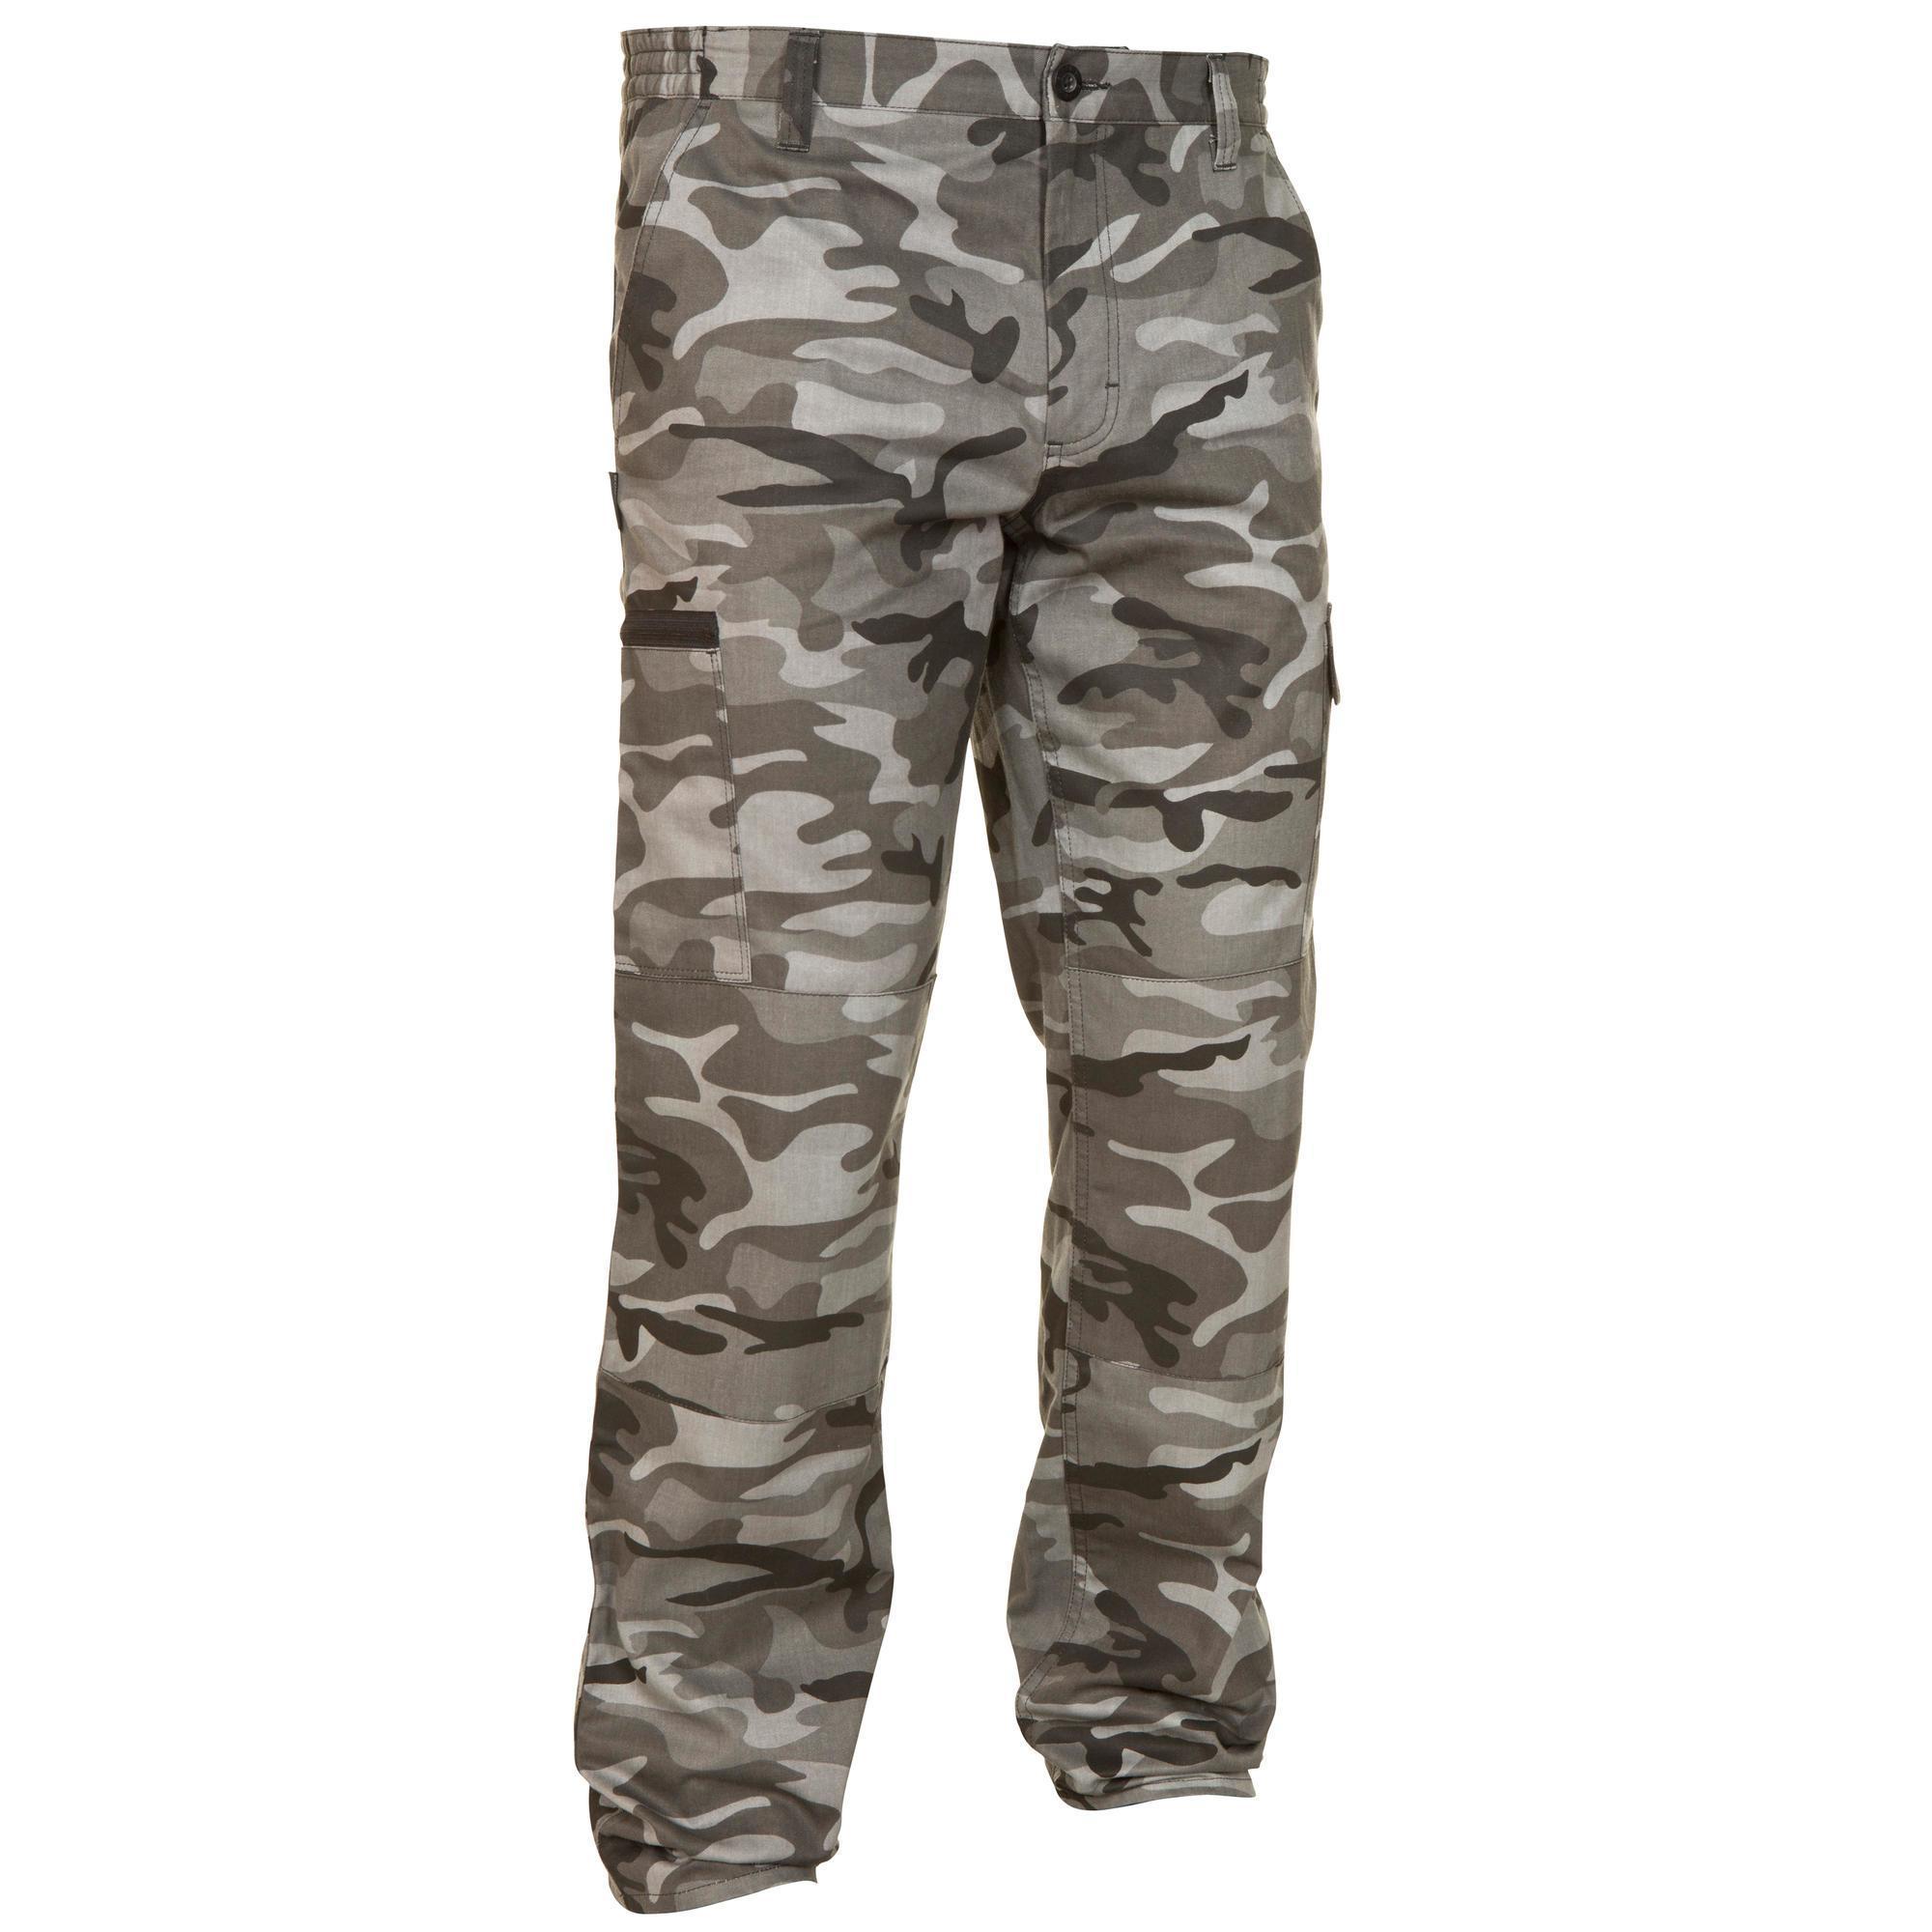 Jagdhose Steppe 300 Camouflage schwarz   Sportbekleidung > Sporthosen > Trekkinghosen   Solognac